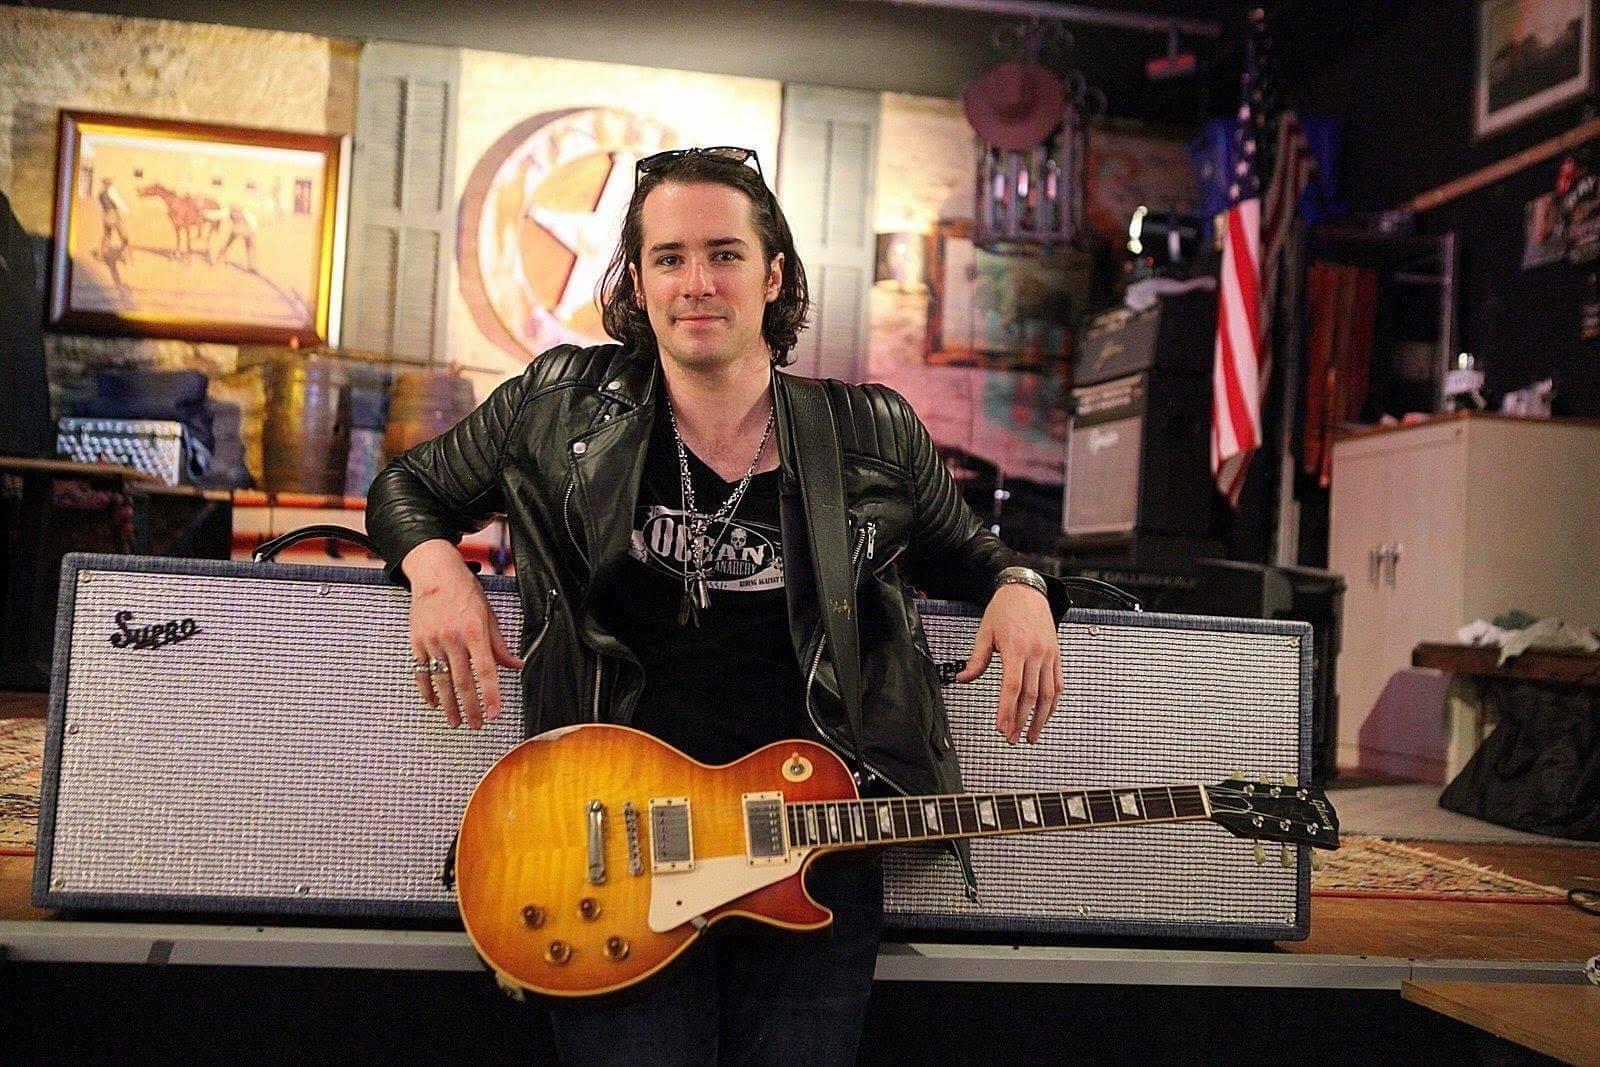 Multi-Award Winning guitarist Ryan McGarvey for D'Angelico Guitars rocking his ICJUK tee Design.